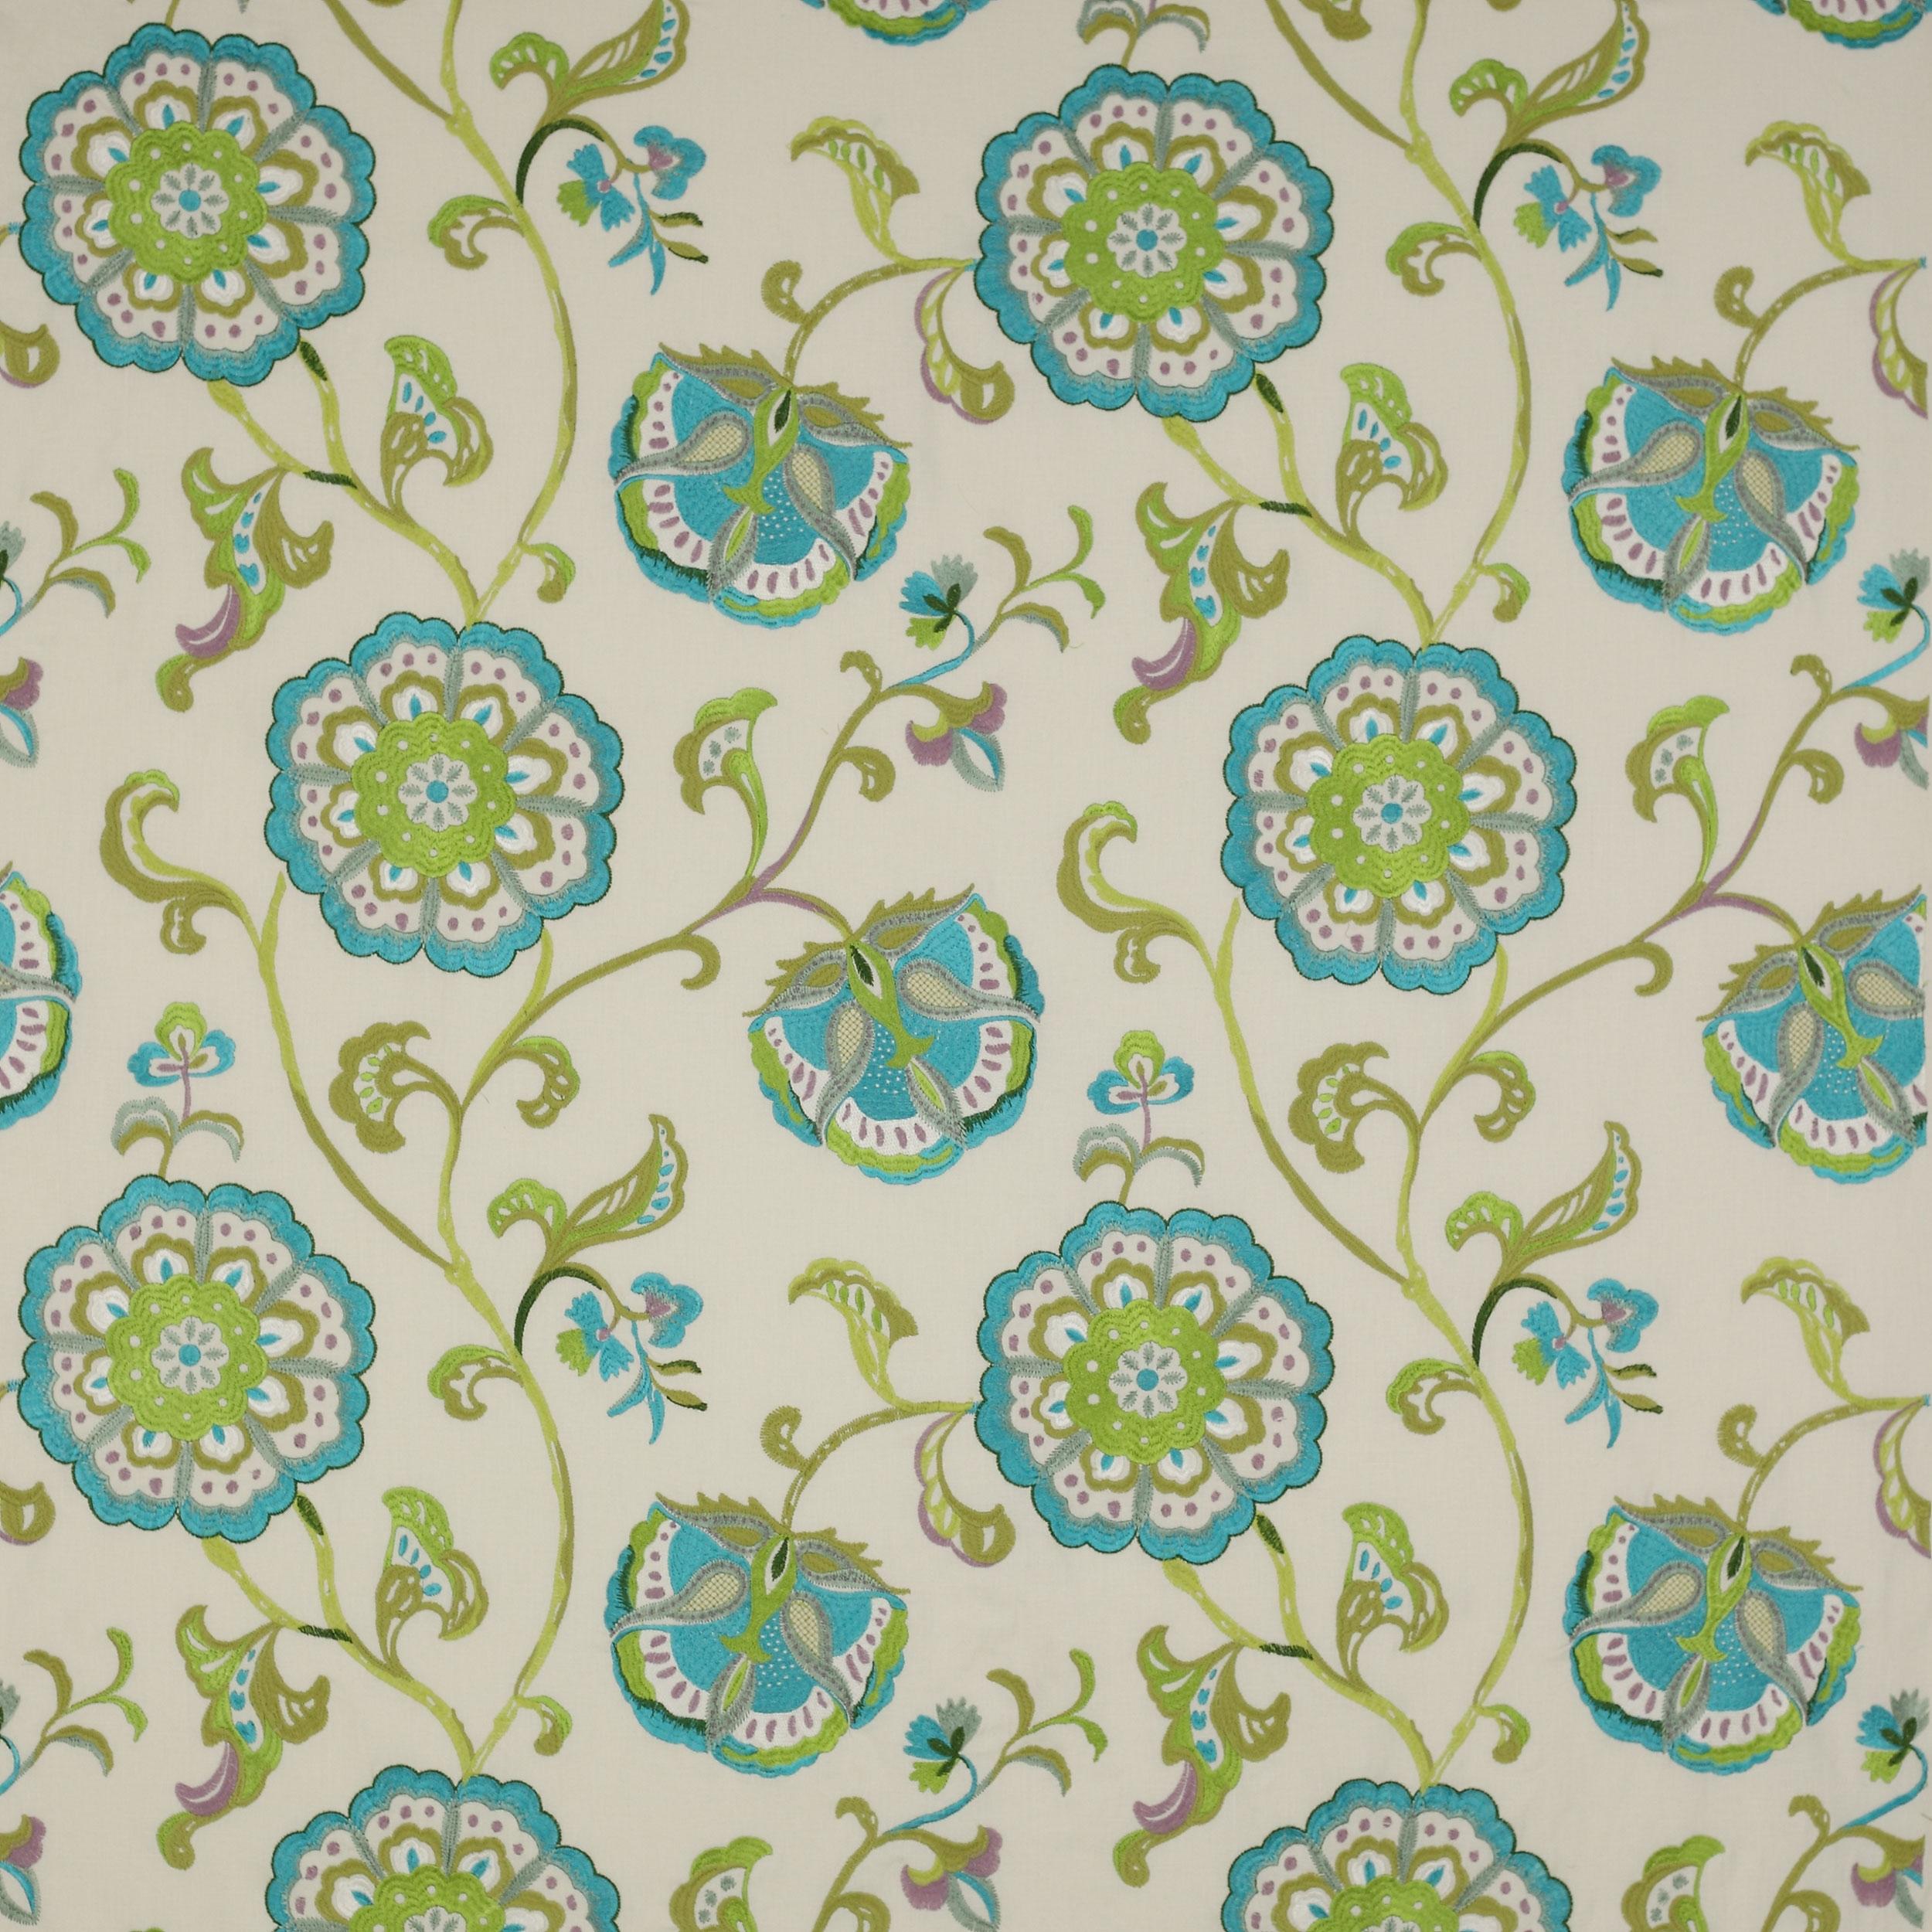 Tissu mayara tissus par diteur manuel canovas le boudoir des etoffes - Tissu manuel canovas ...